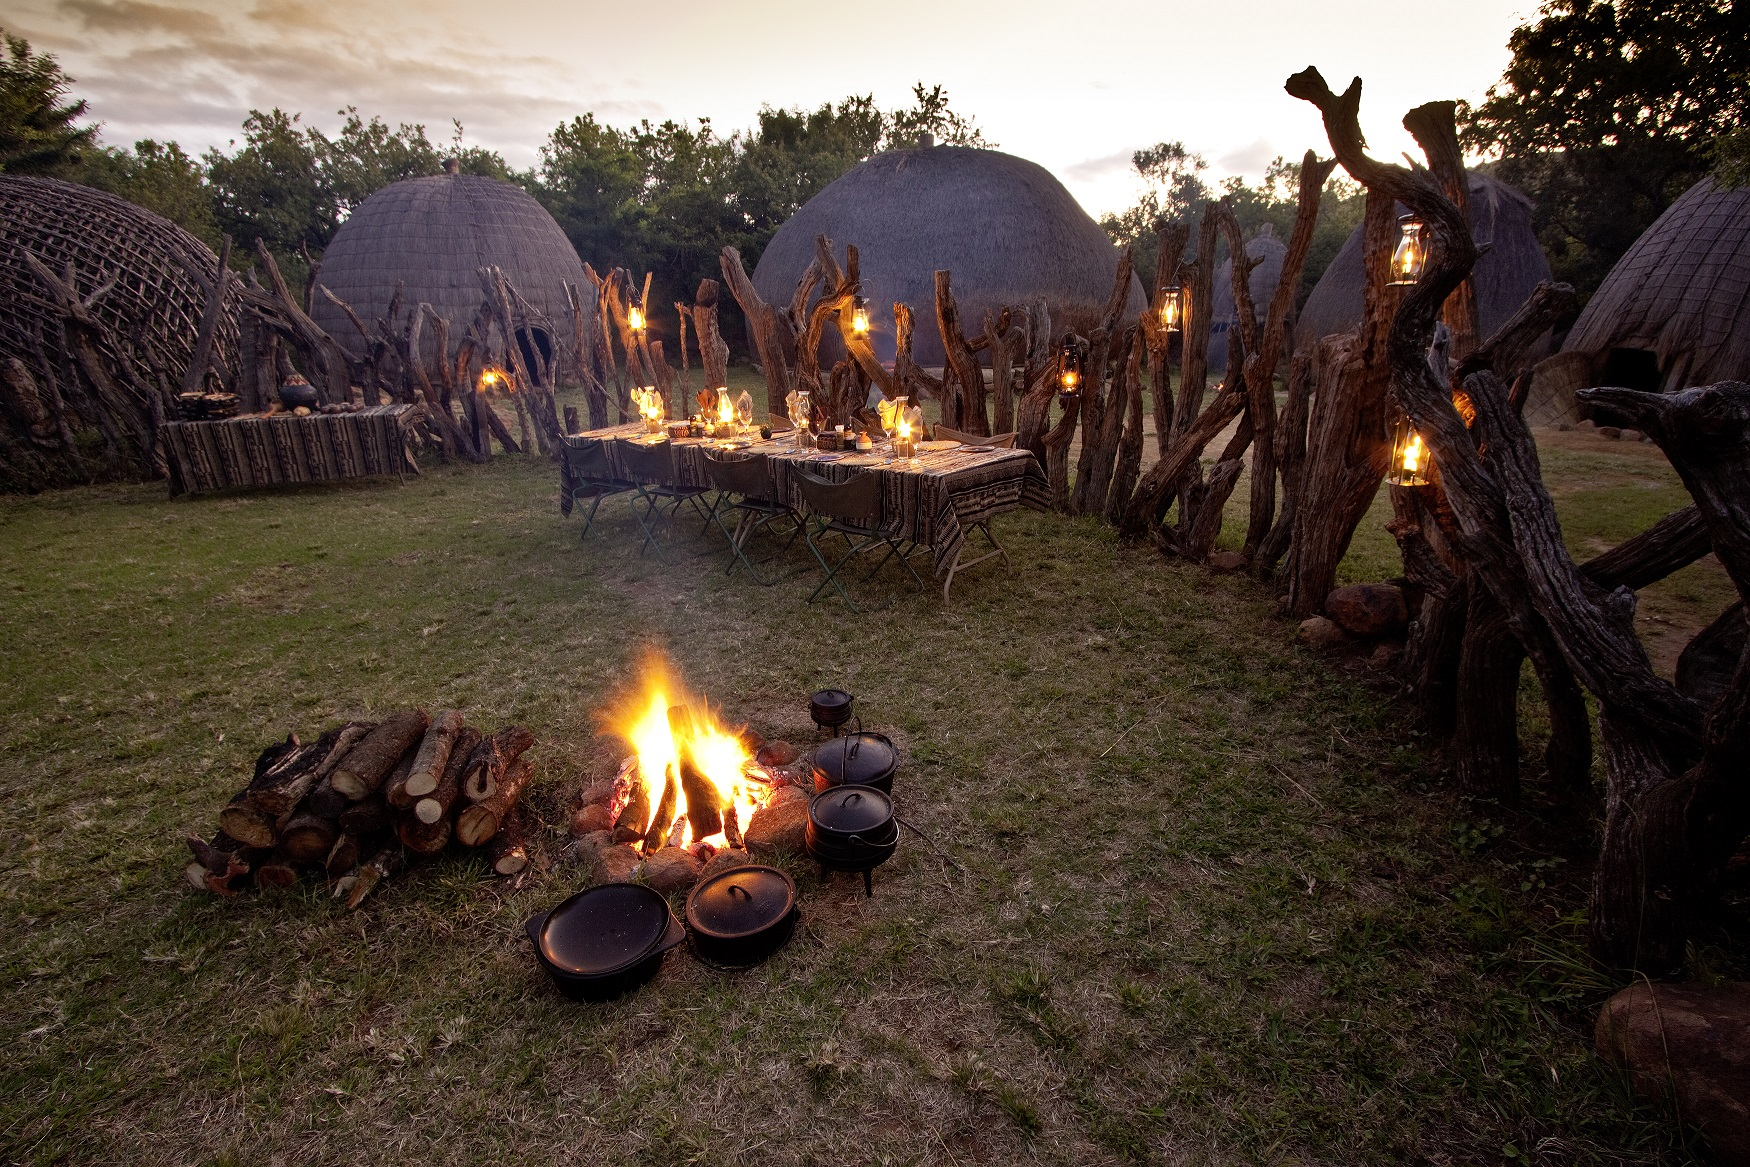 isibindi-zulu-boma-dinner-1 Reduced